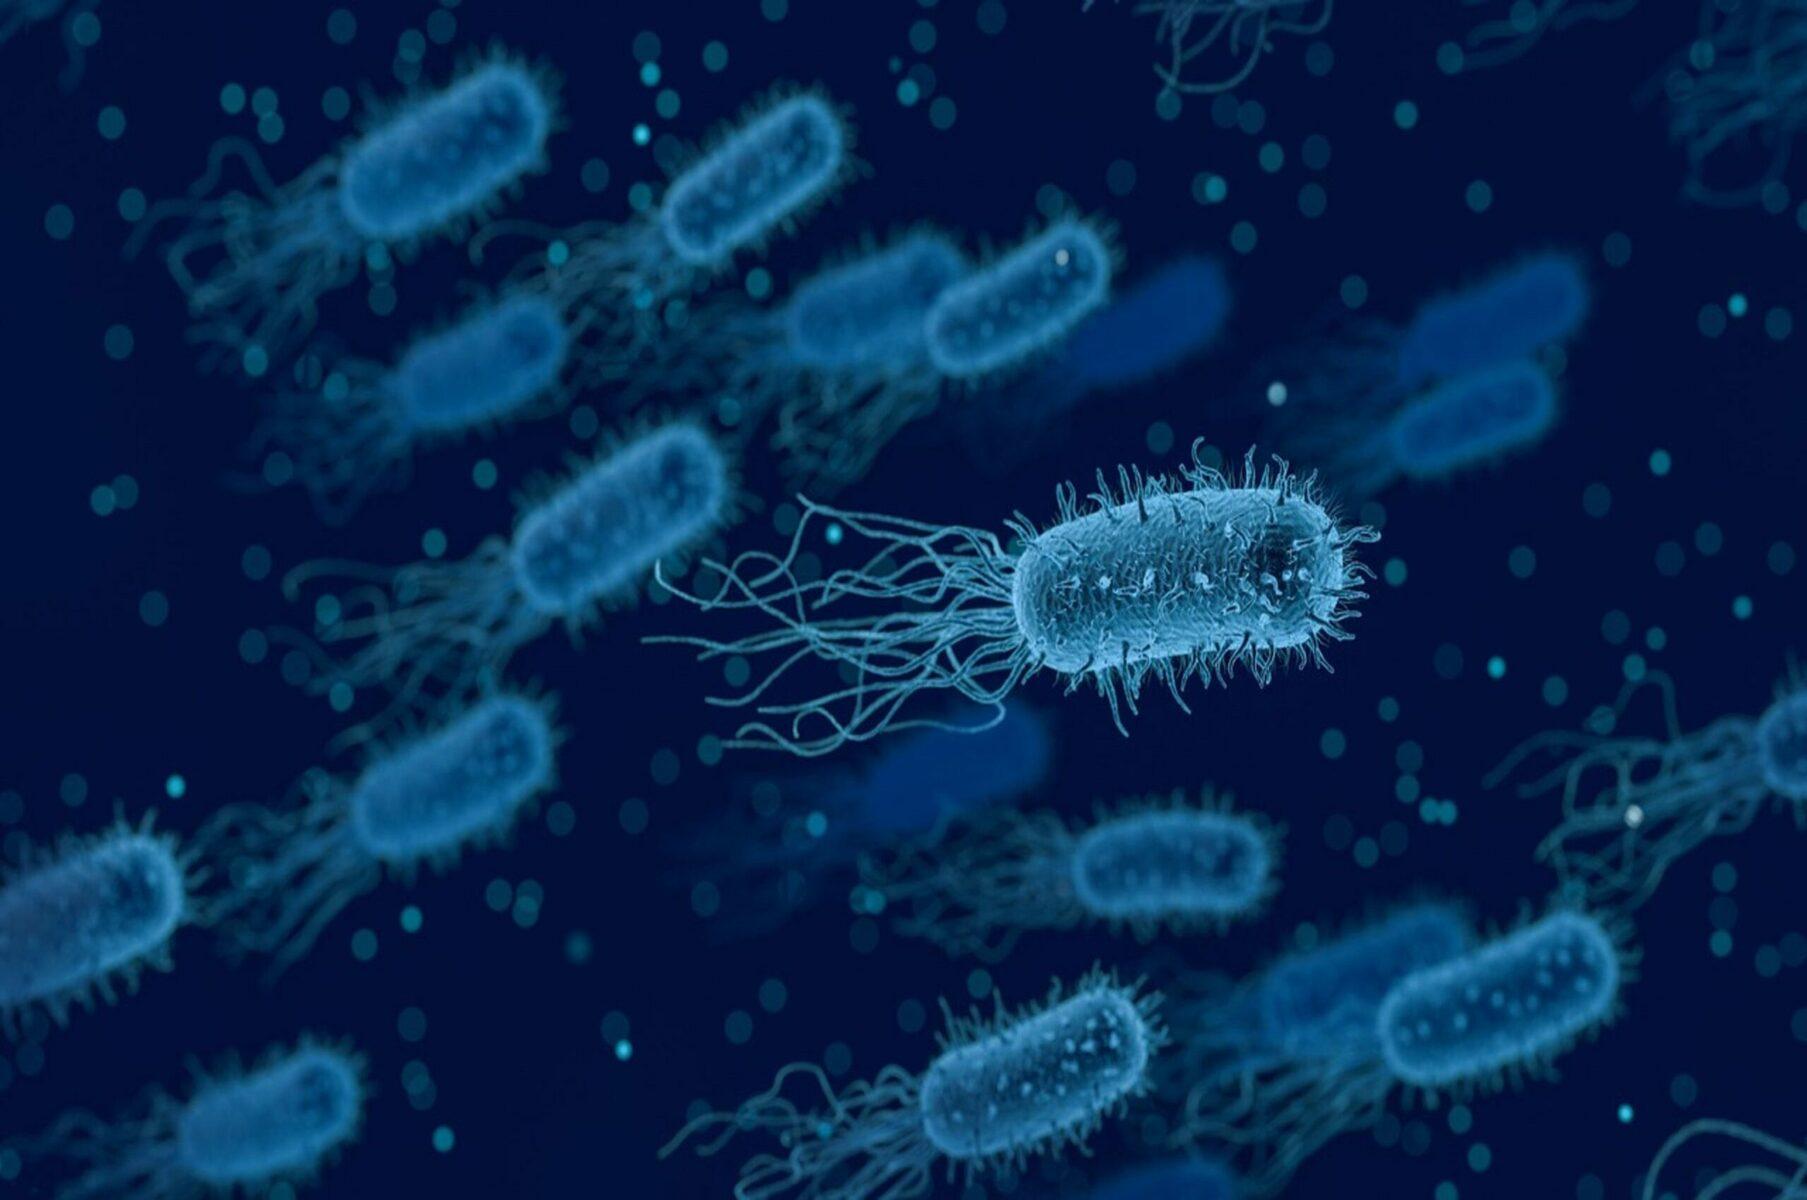 batteri e lotta alle malattie